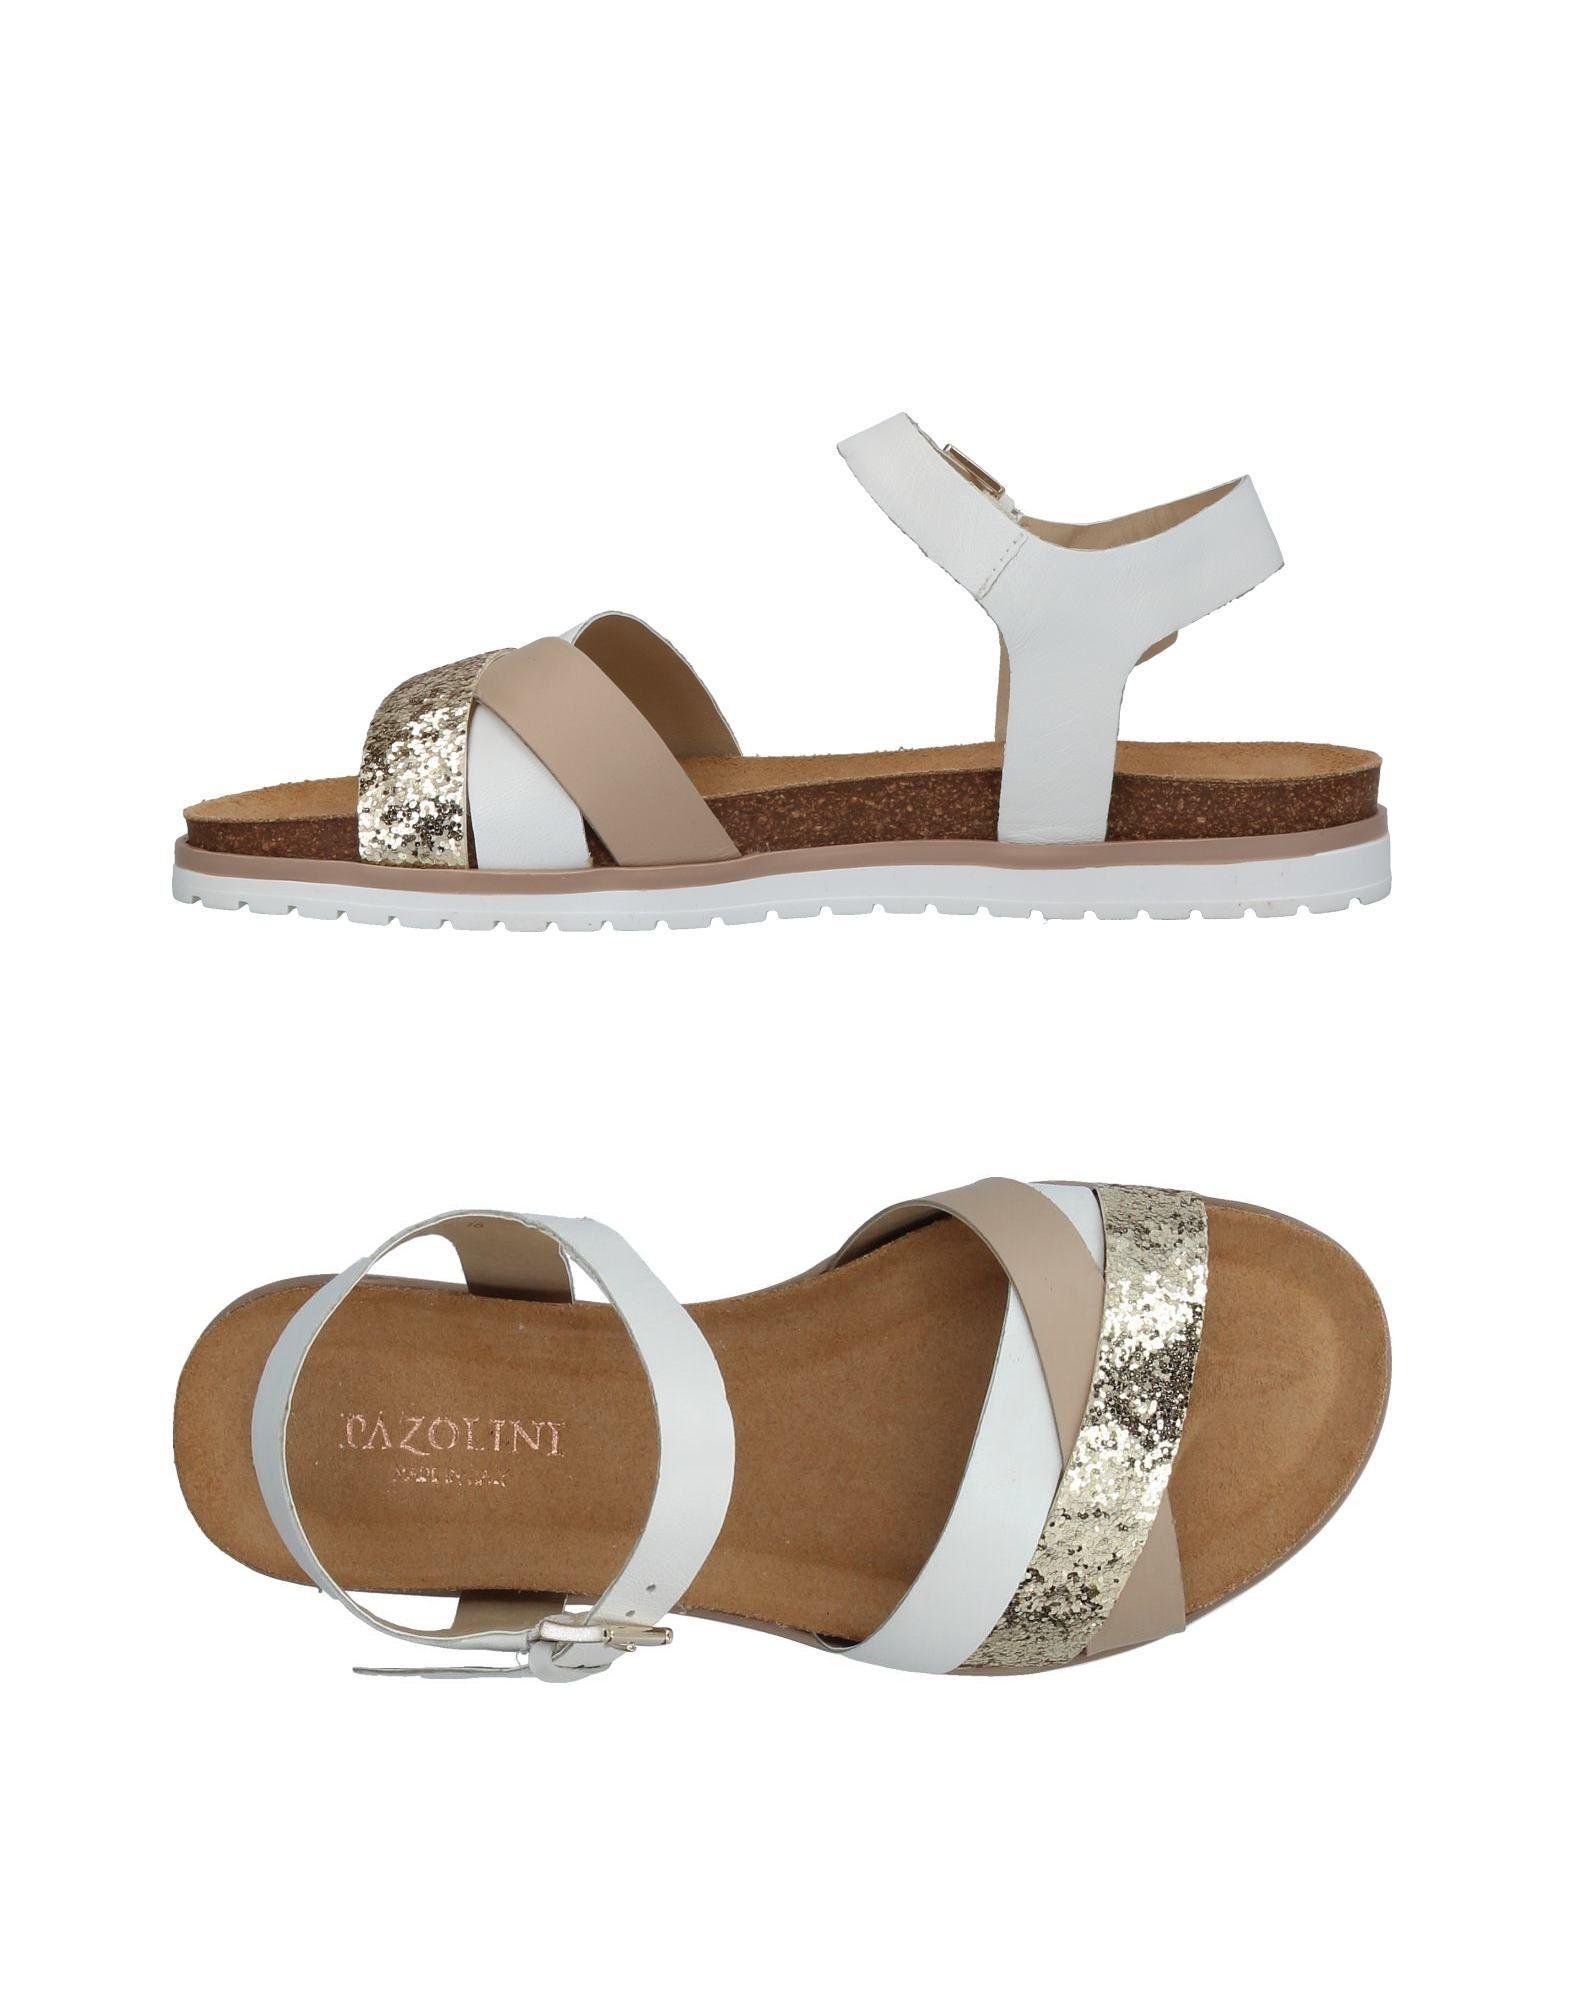 Carlo Pazolini Sandalen Damen  11407585XI Gute Qualität beliebte Schuhe Schuhe beliebte 0539c2